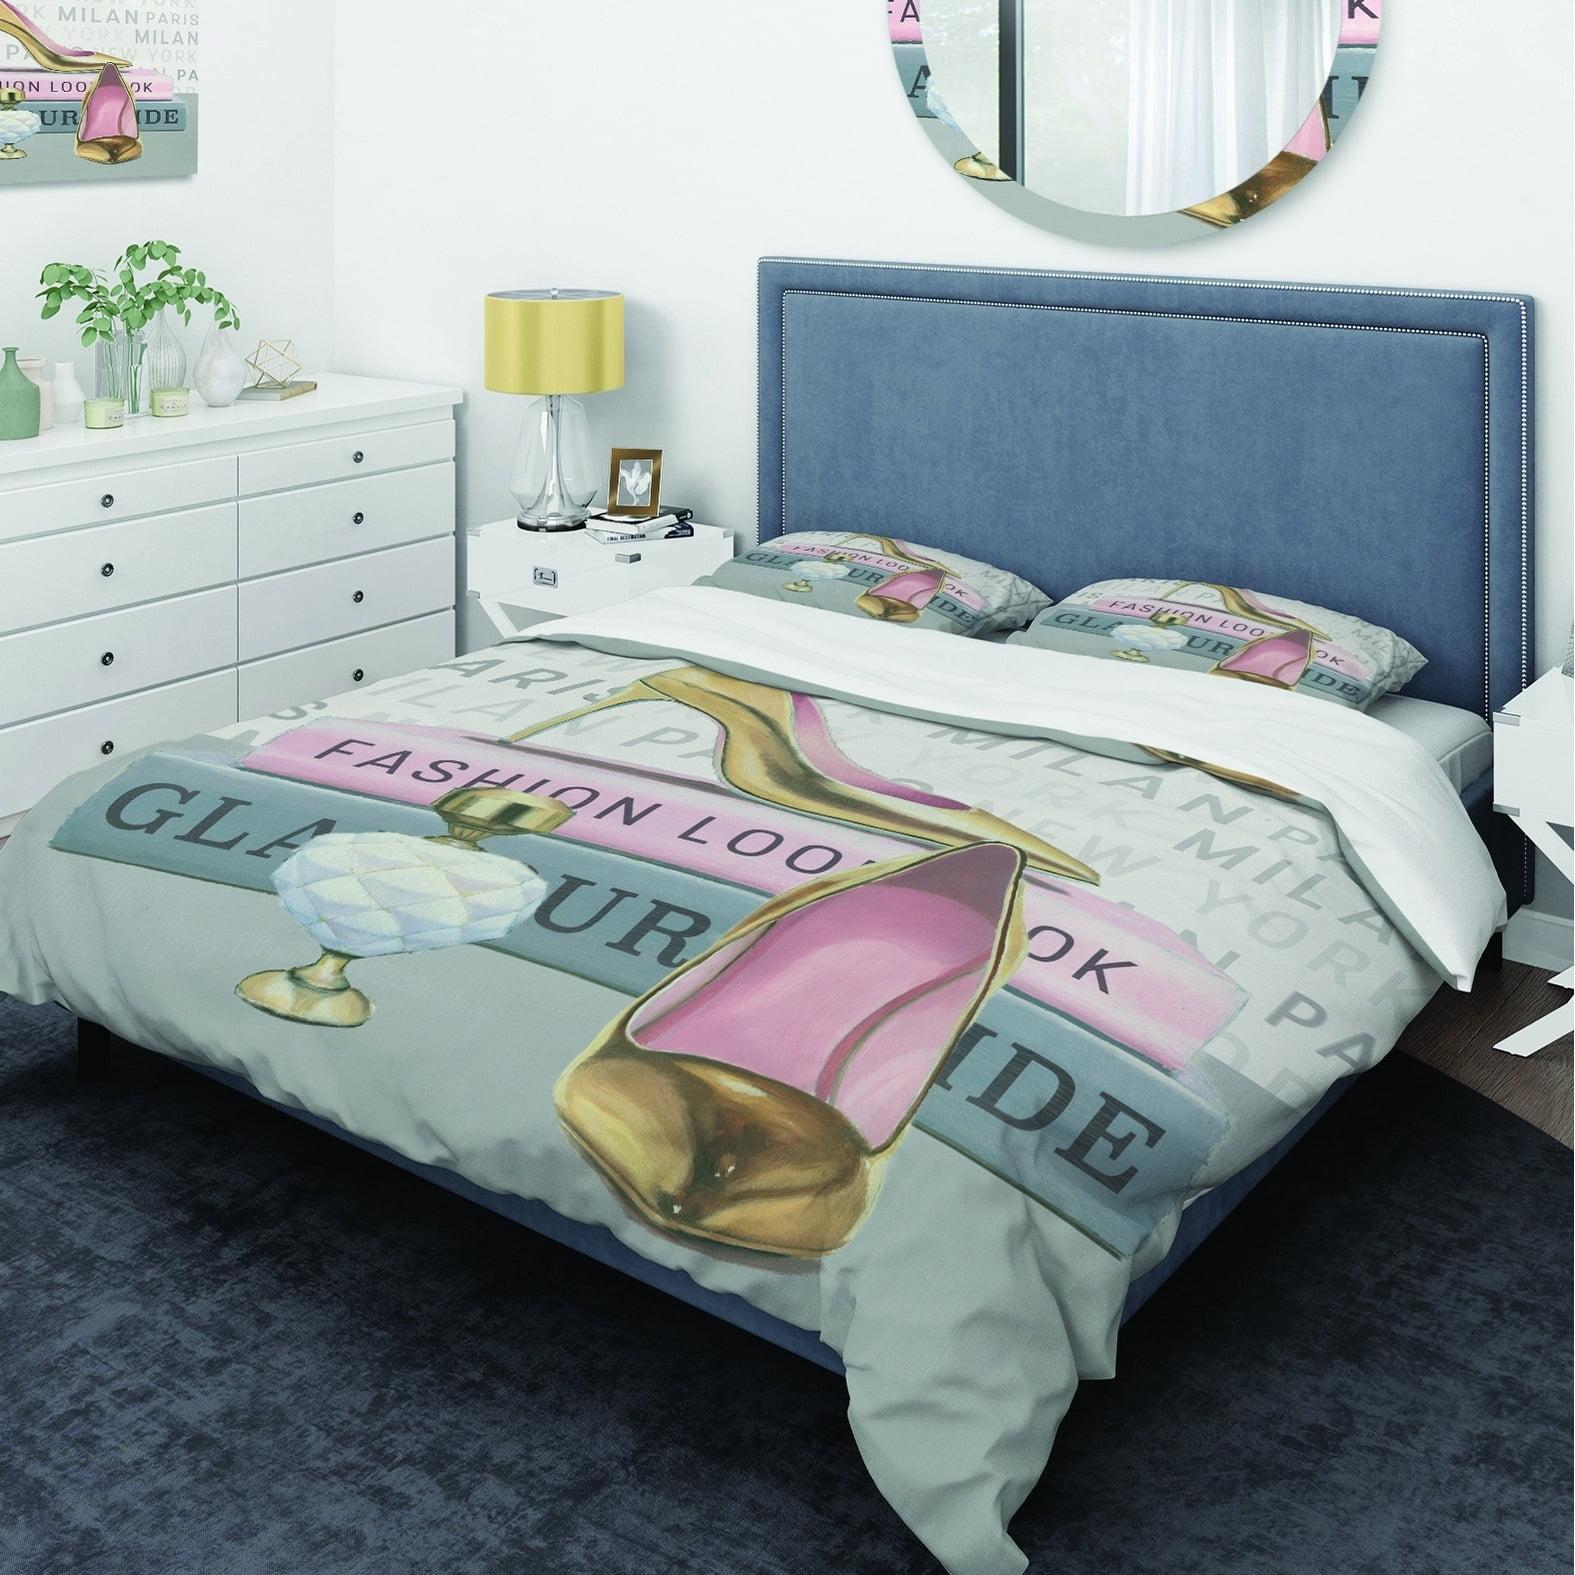 DESIGN ART Designart 'Glam fashion High Heels III' Glam Bedding Set - Duvet Cover & Shams